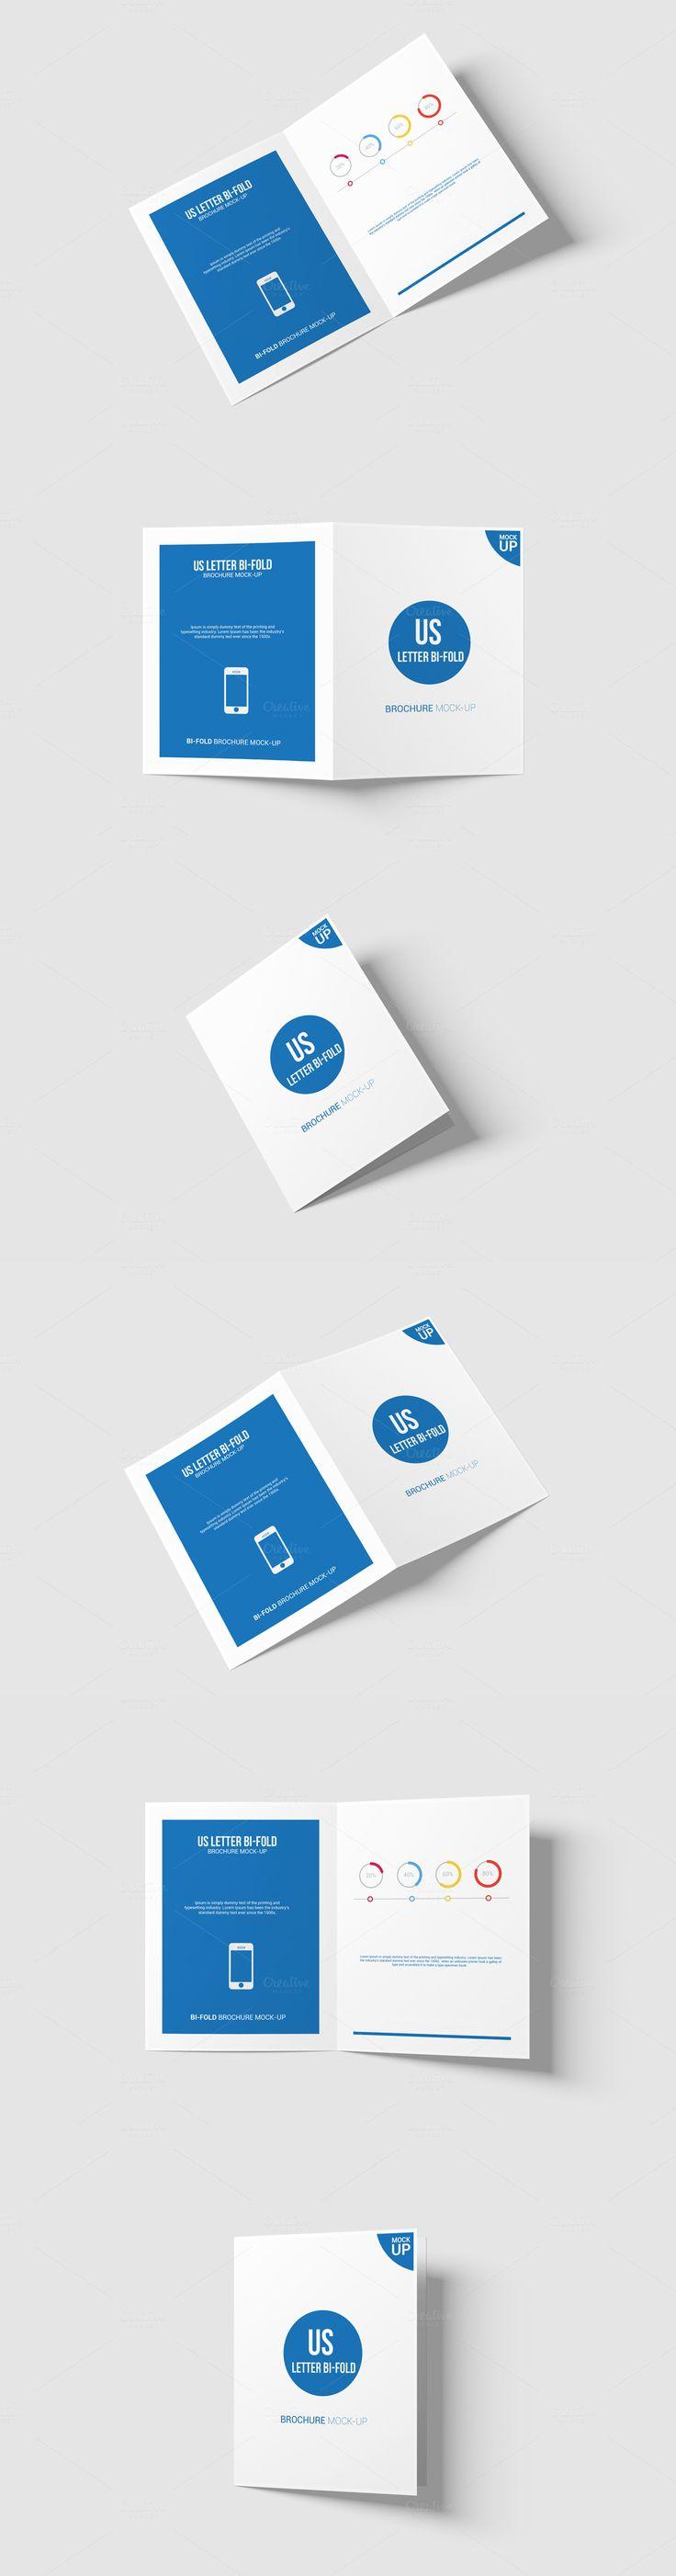 Bi-Fold Brochure Mock-Up - US Letter. Download here: https://creativemarket.com/AlkStudio/605283?u=ksioks